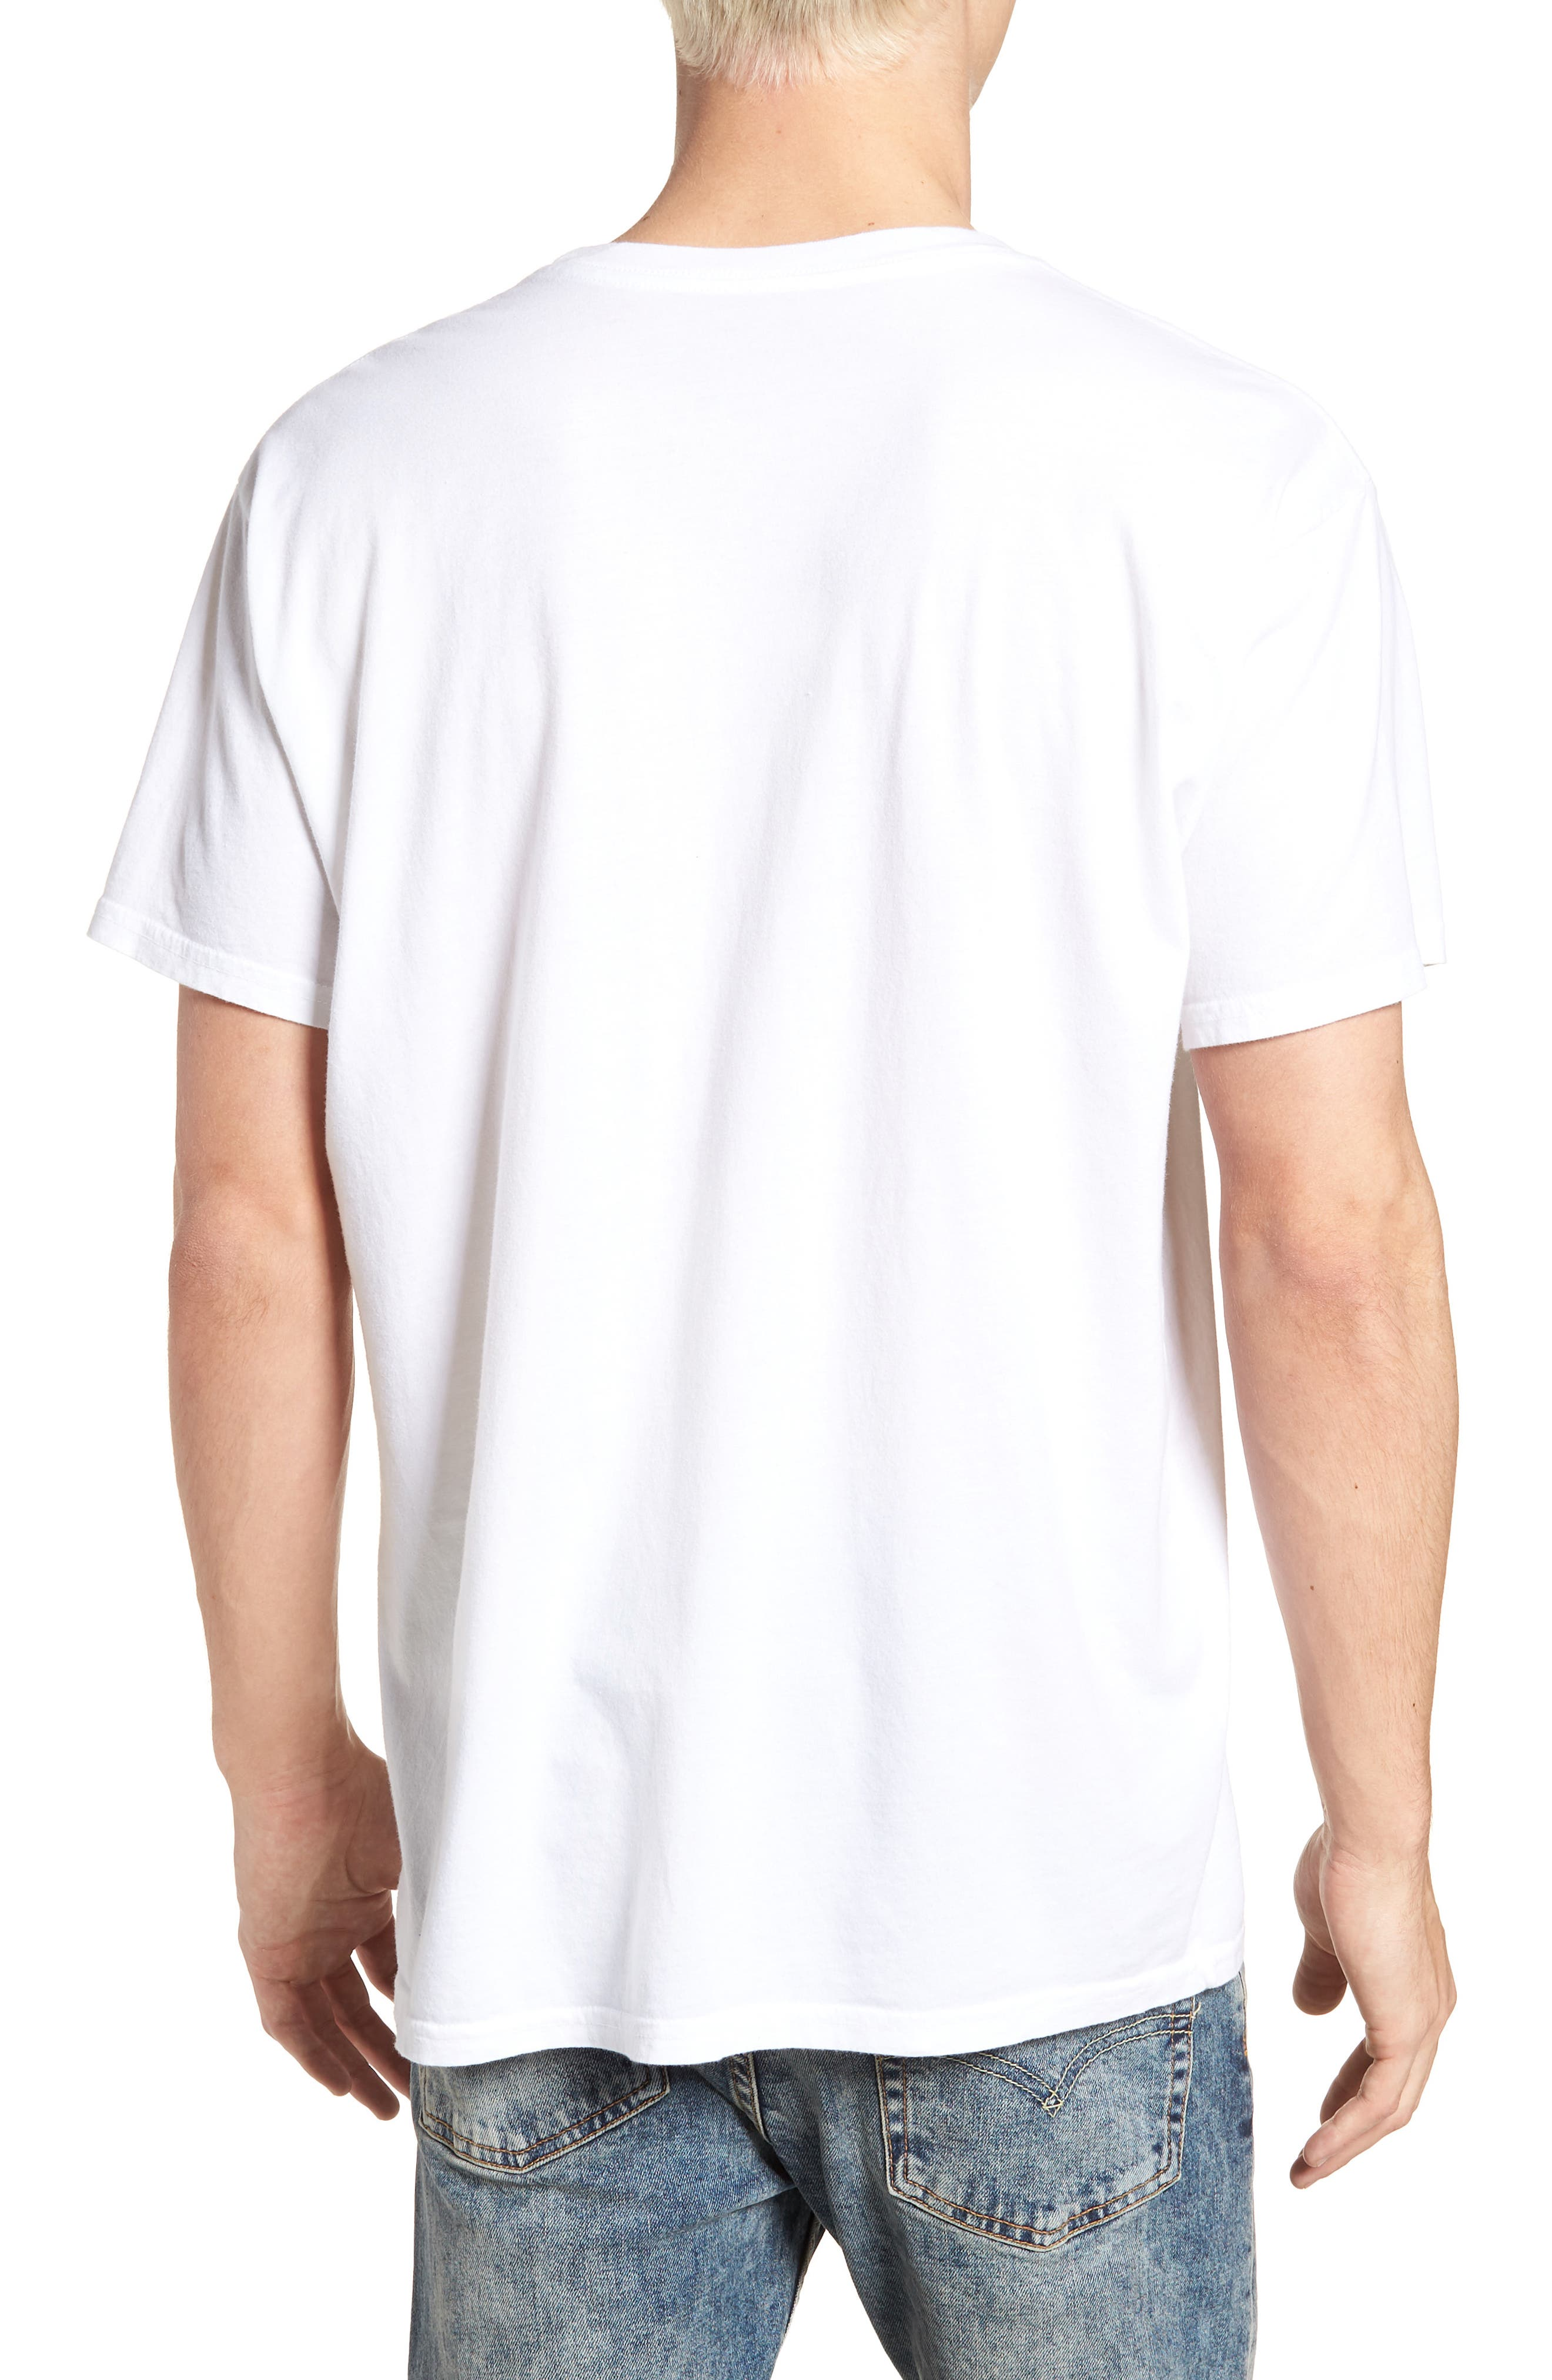 Pizza Pizza Graphic T-Shirt,                             Alternate thumbnail 2, color,                             101